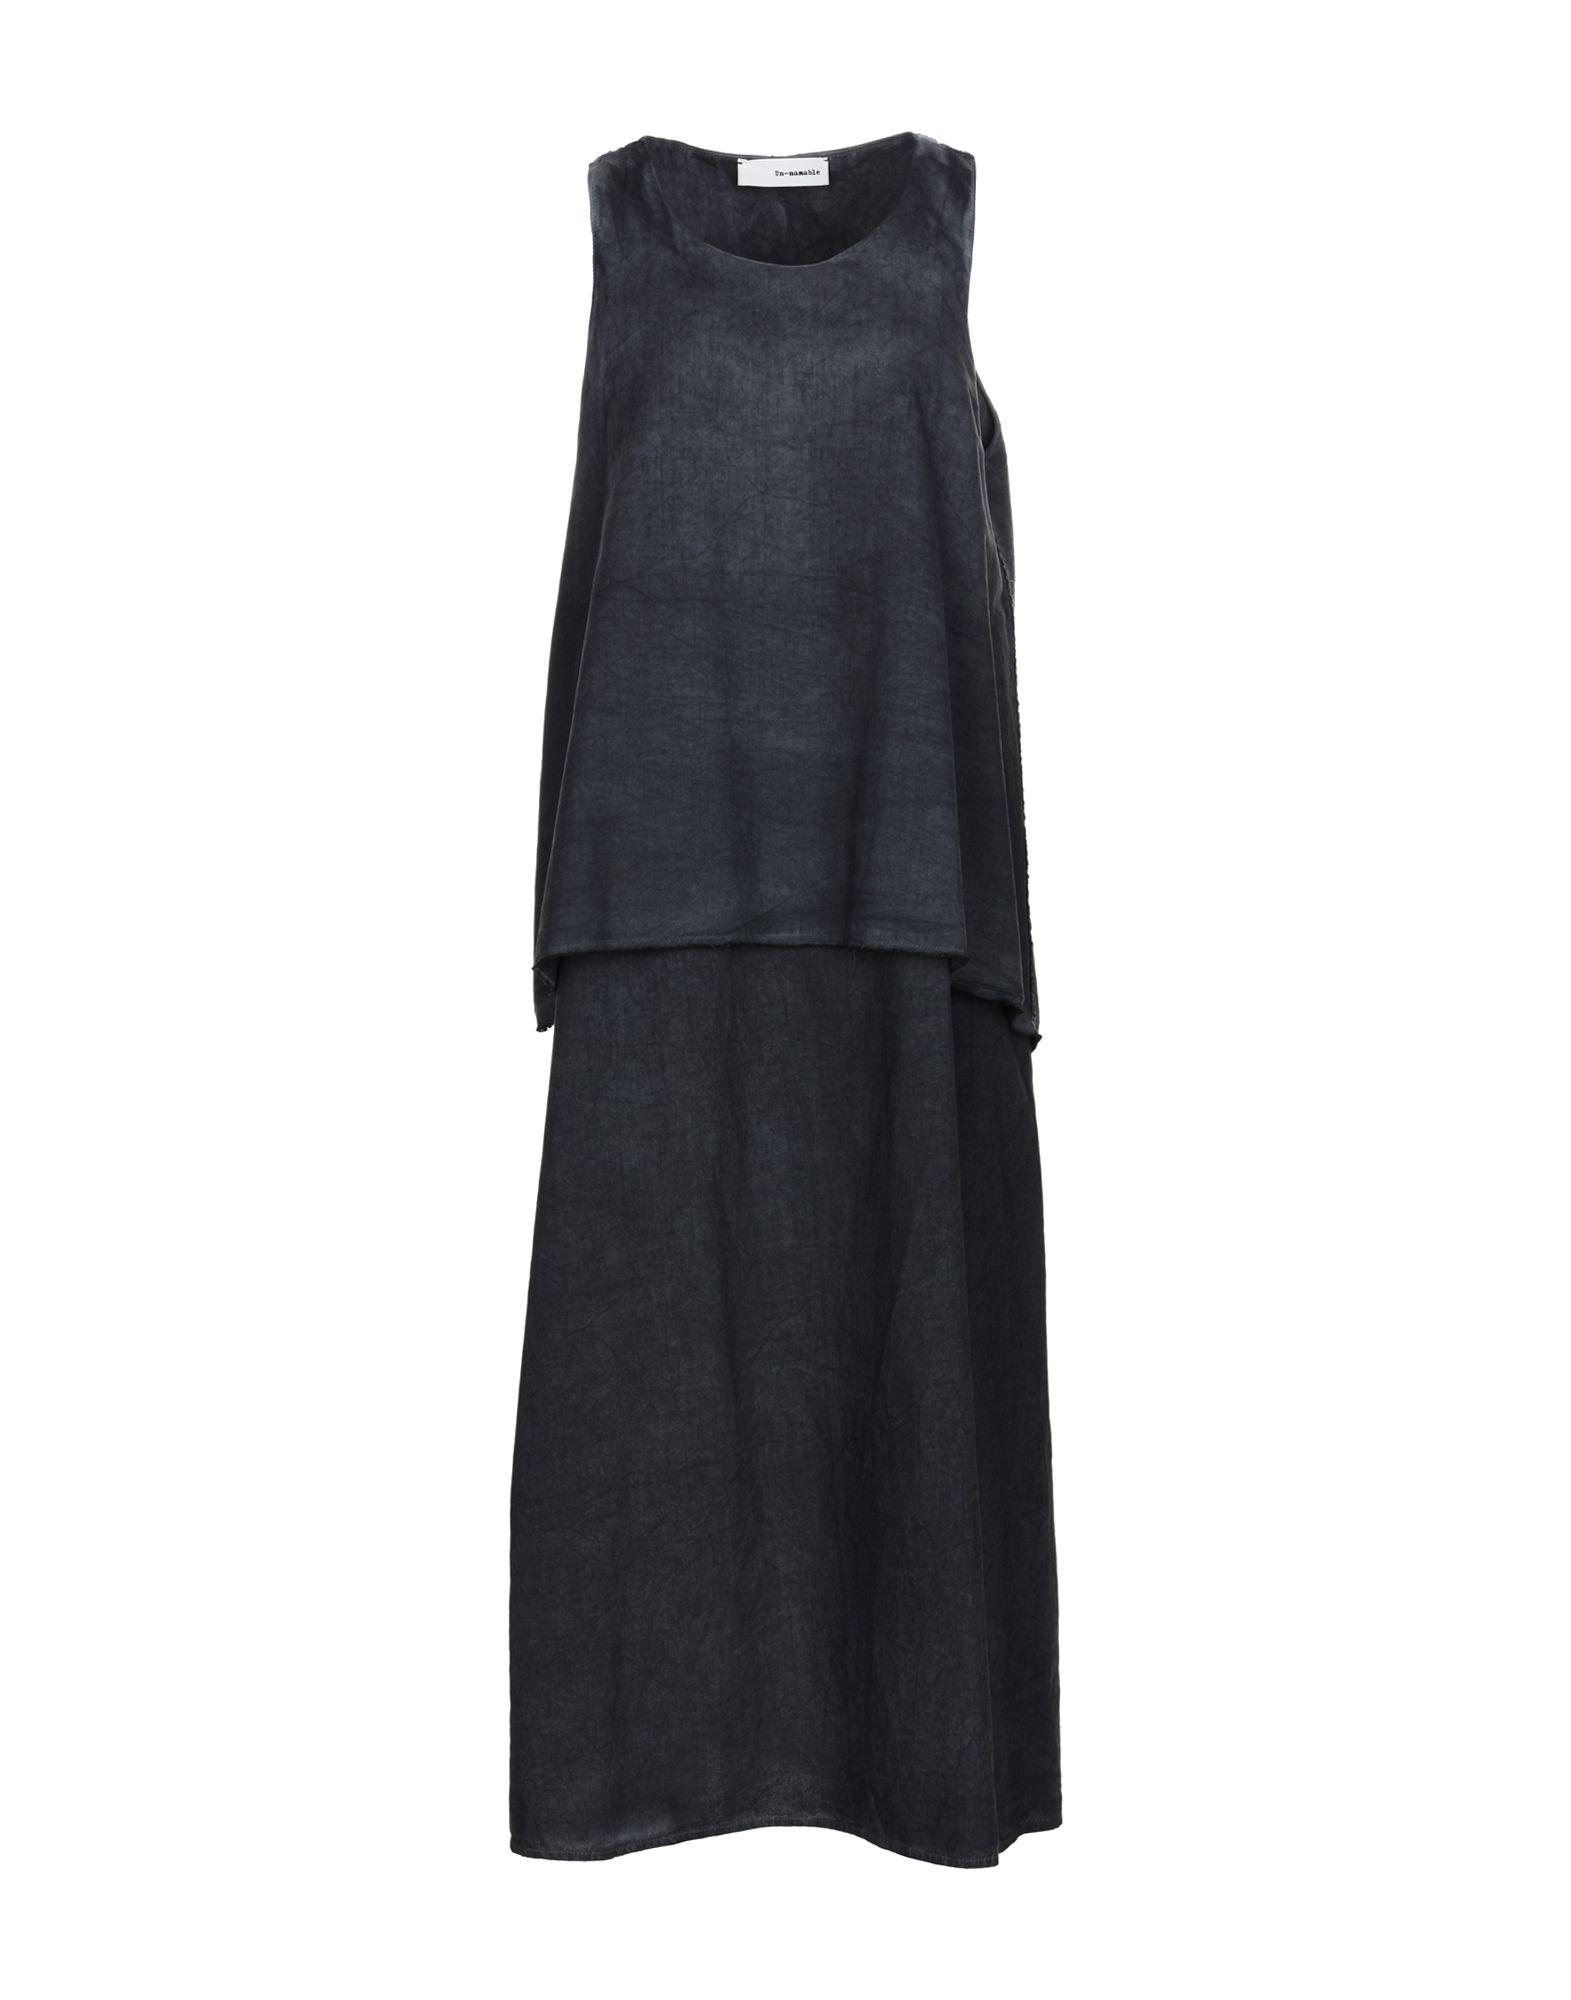 Vestito Lungo Un-Namable Donna - Acquista online su ef6sl